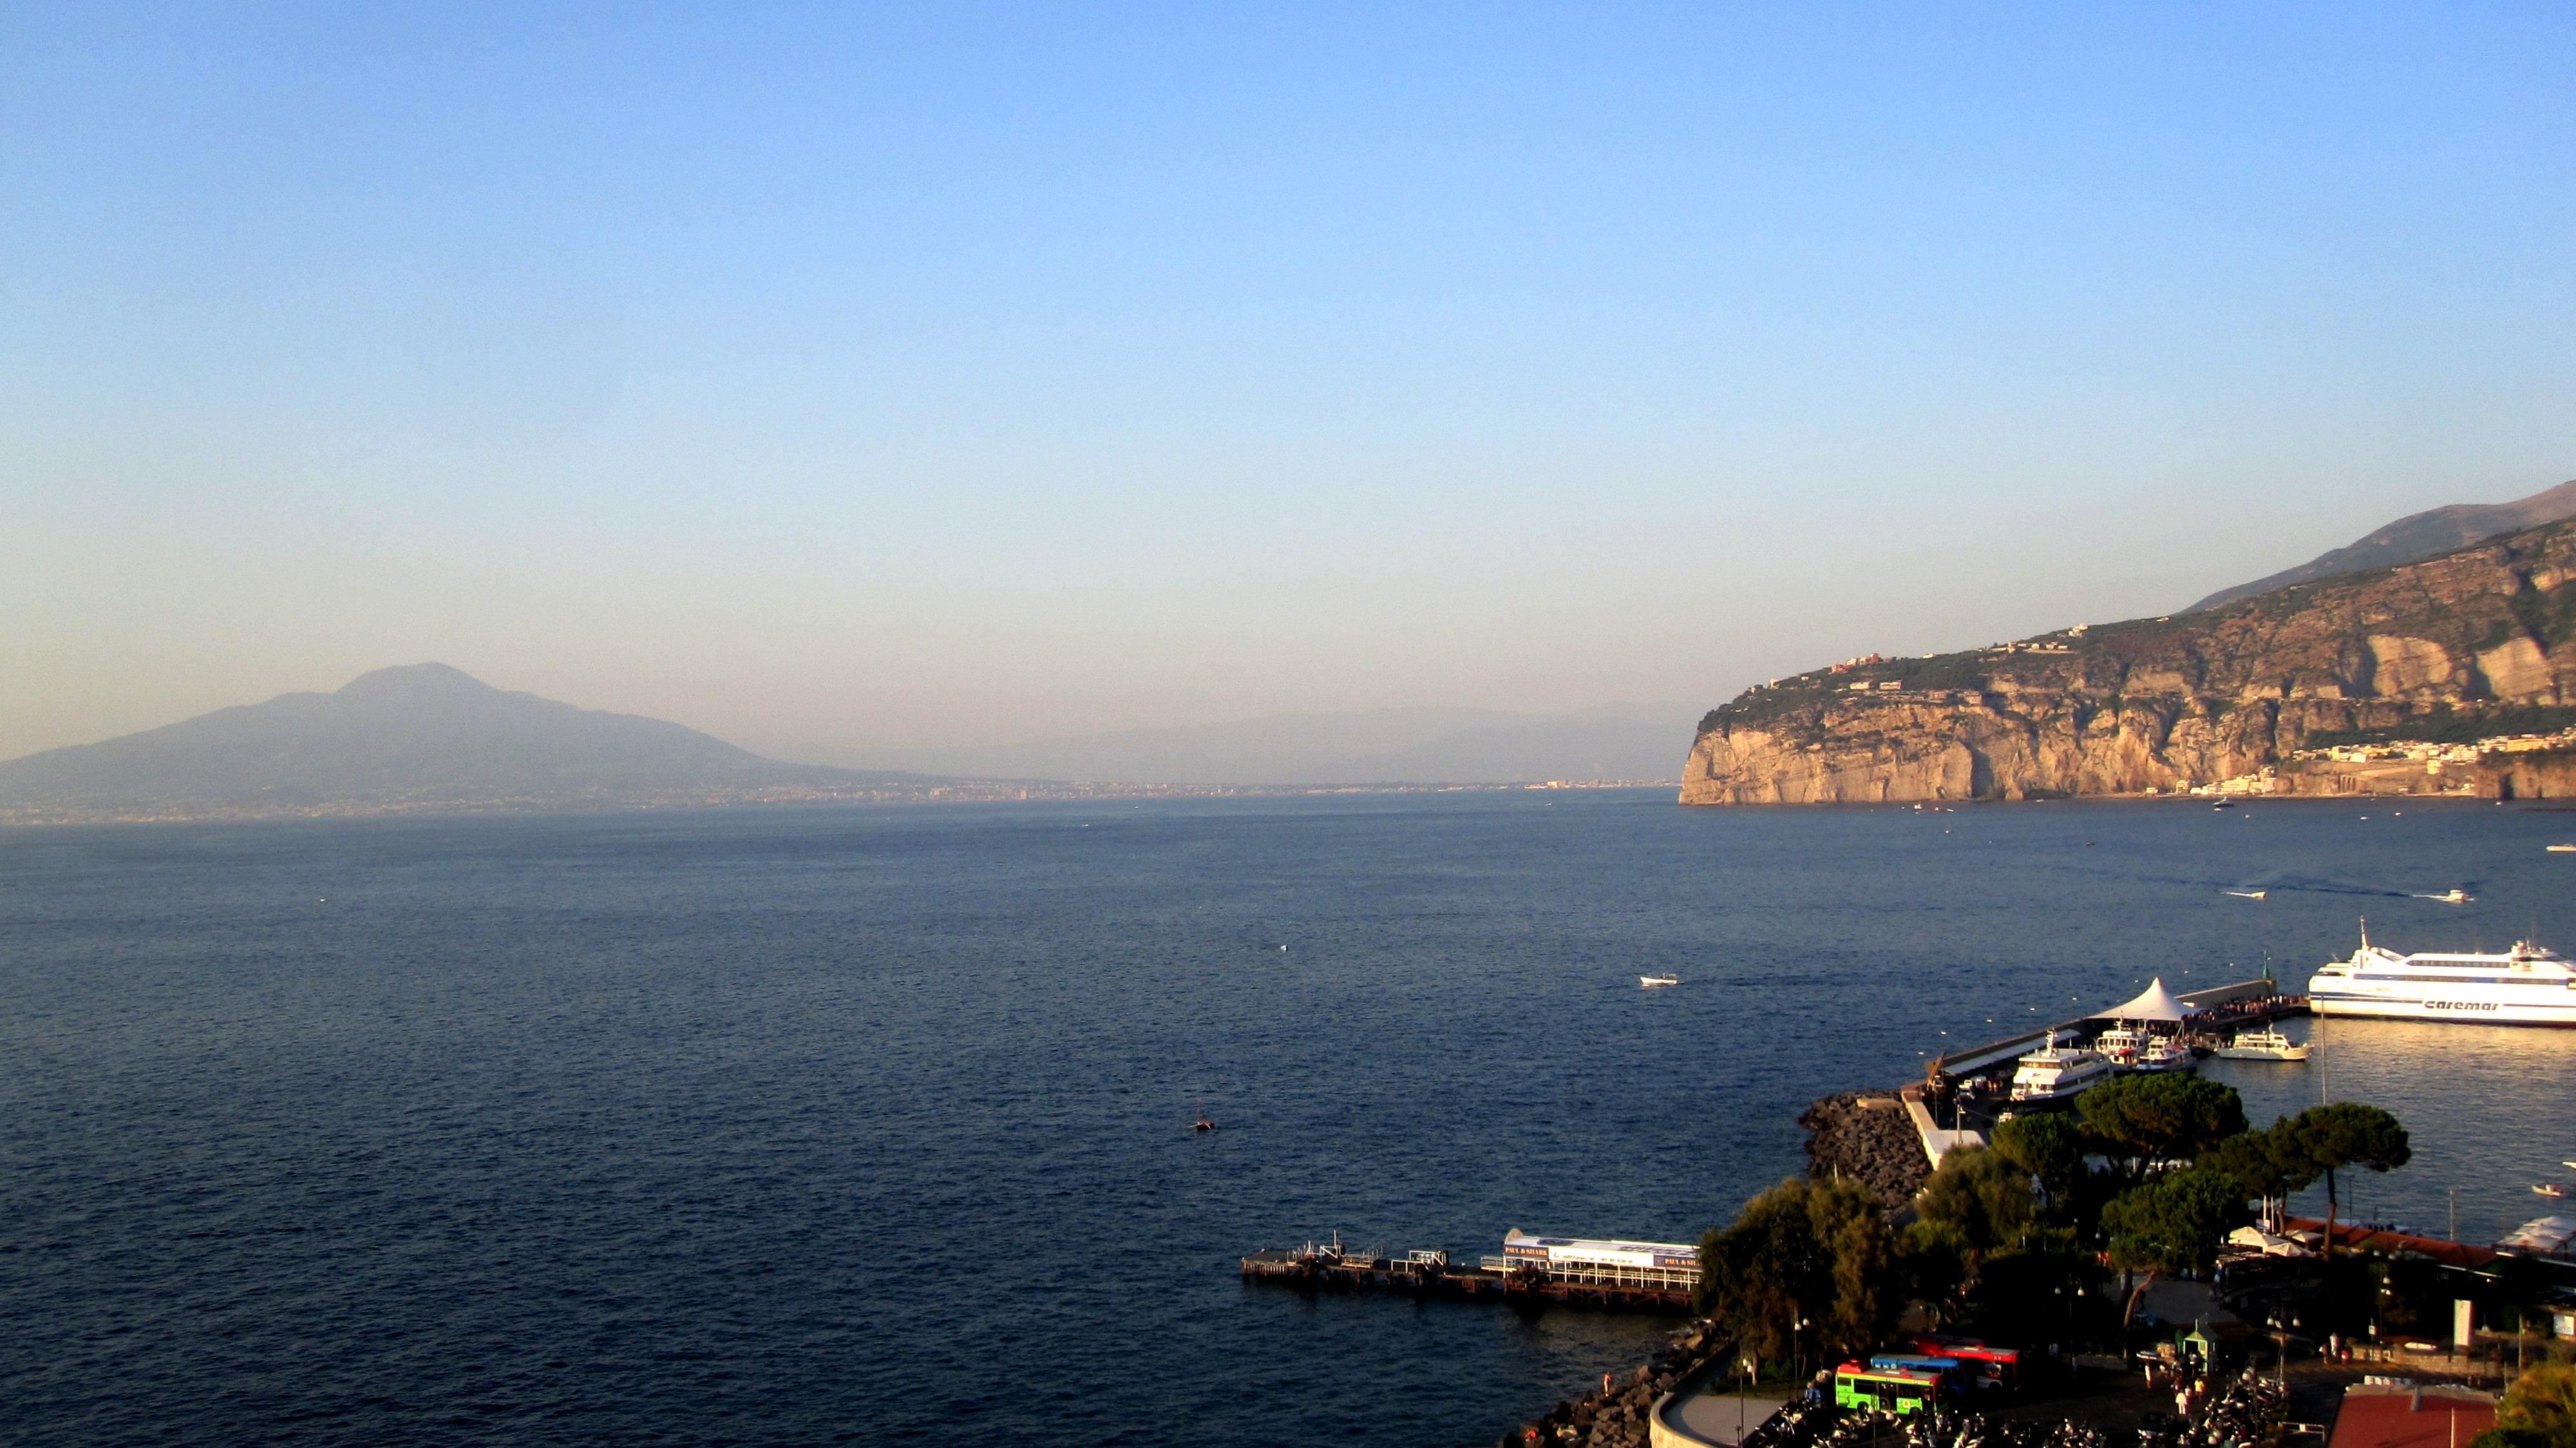 View of the volcano Vesuvio from Sorrento Bay